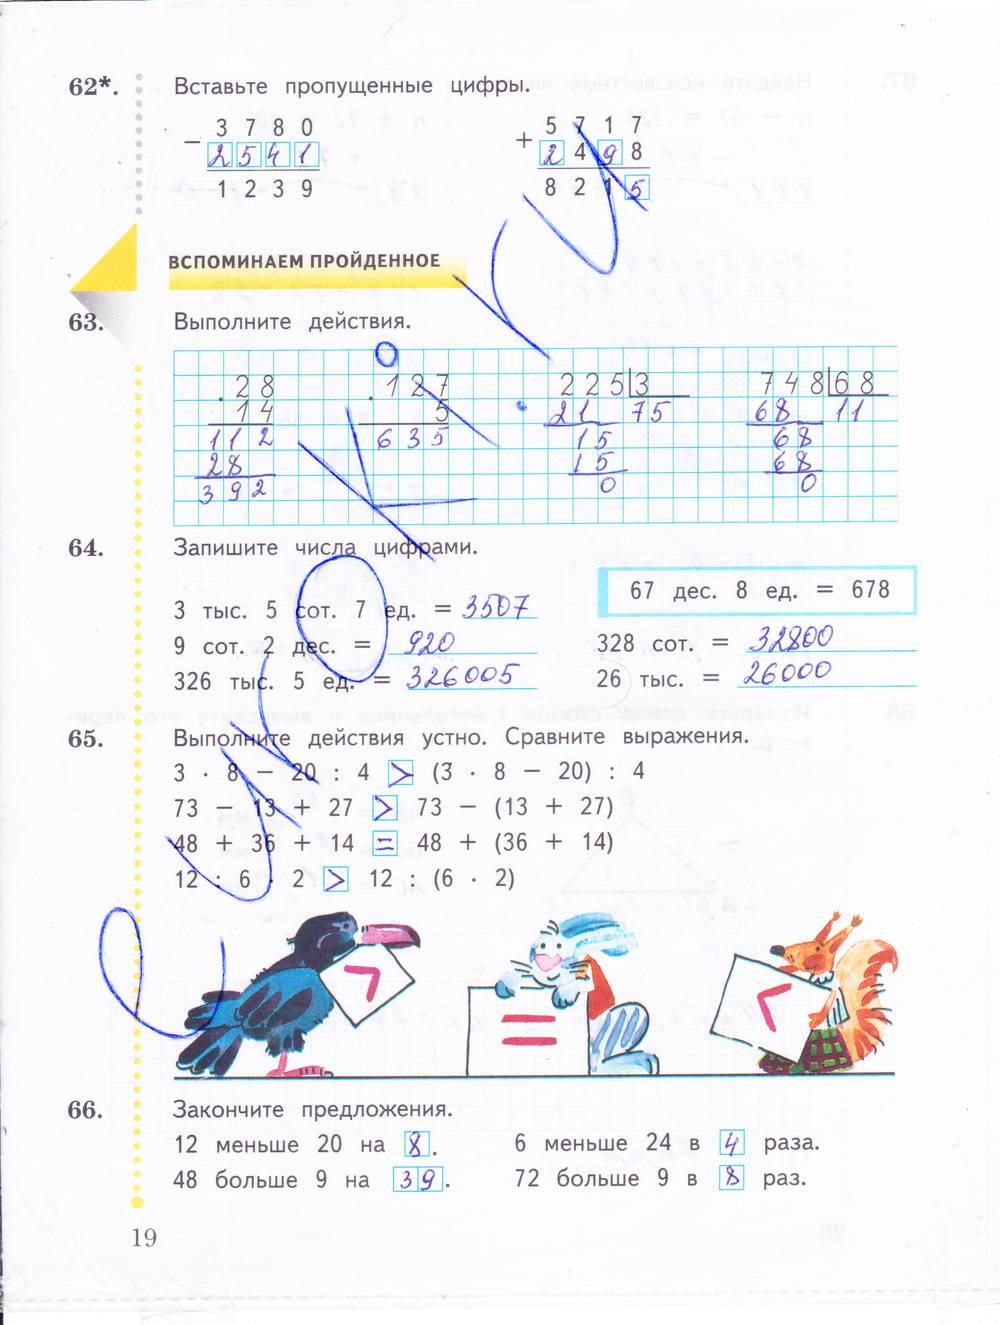 Рабочая юдачева гдз по класс тетрадь математика 4 рудницкая